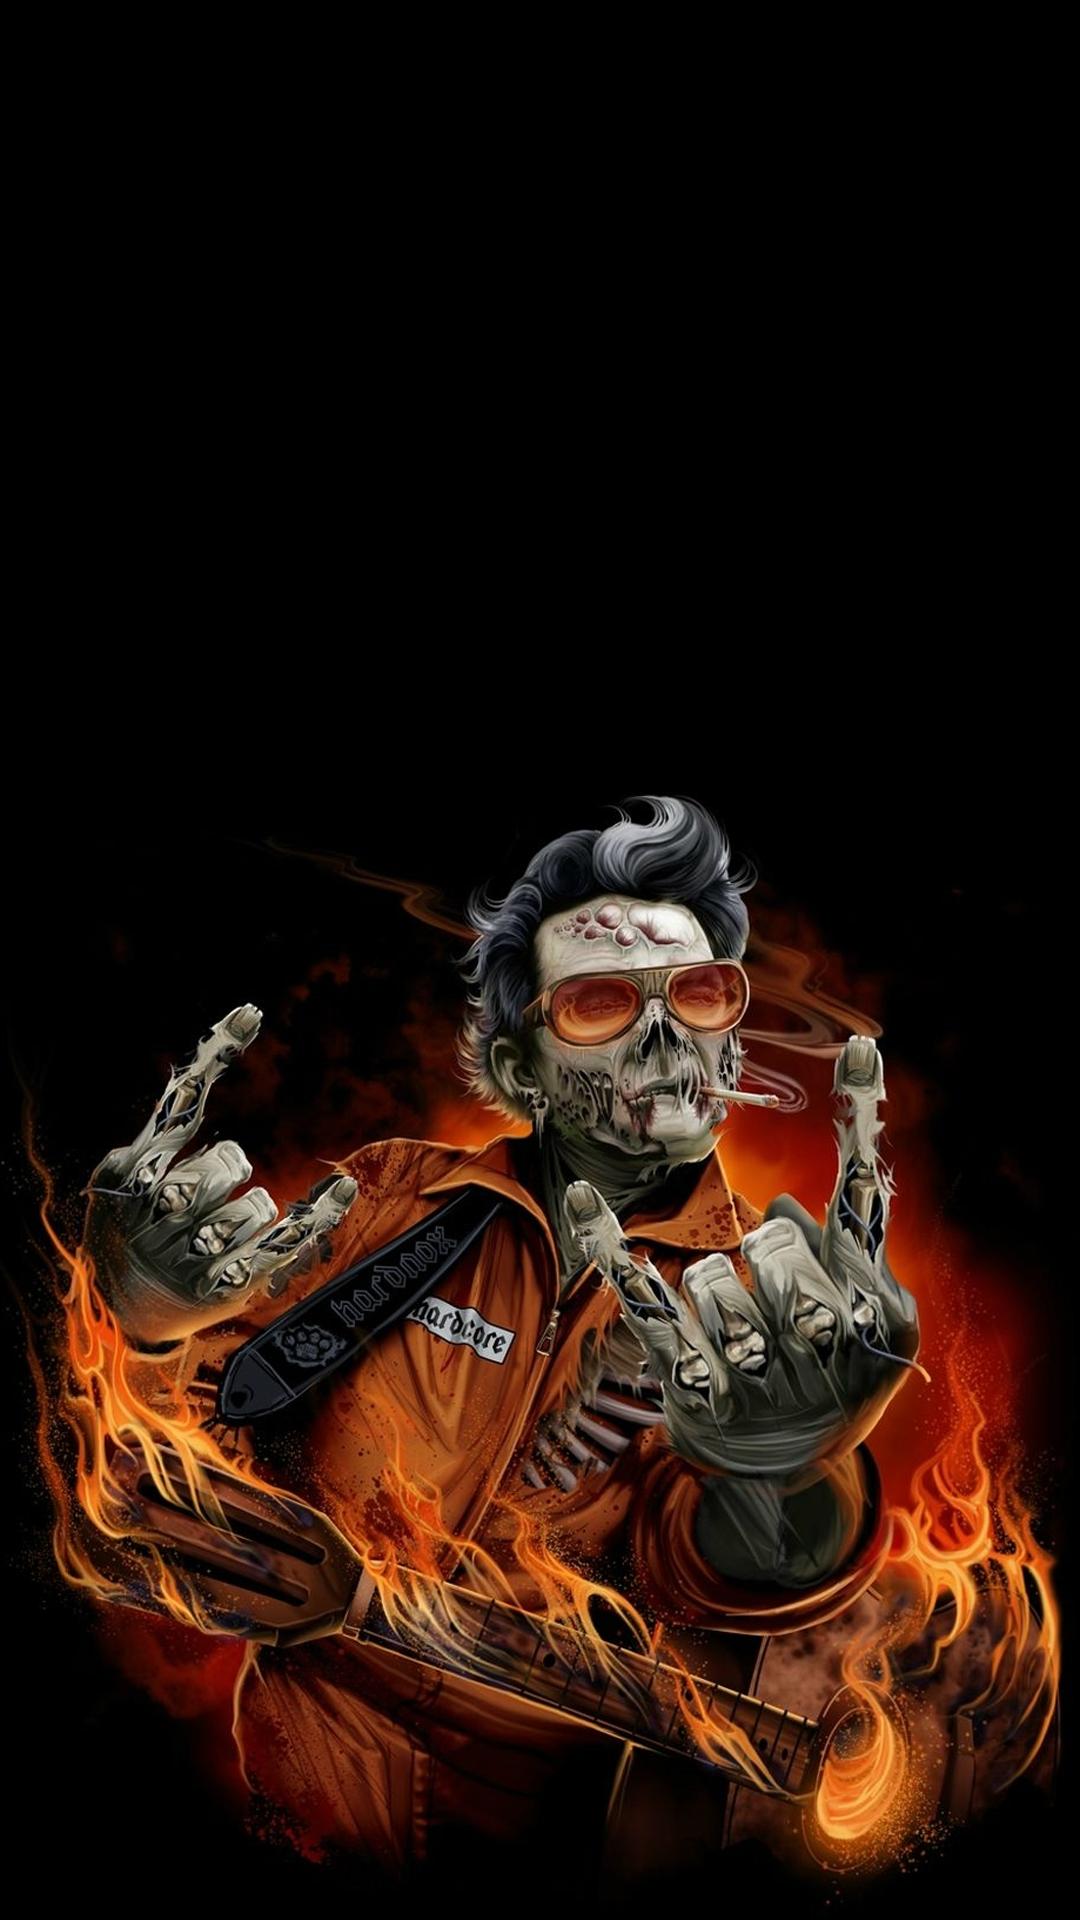 Hard rock zombie Halloween